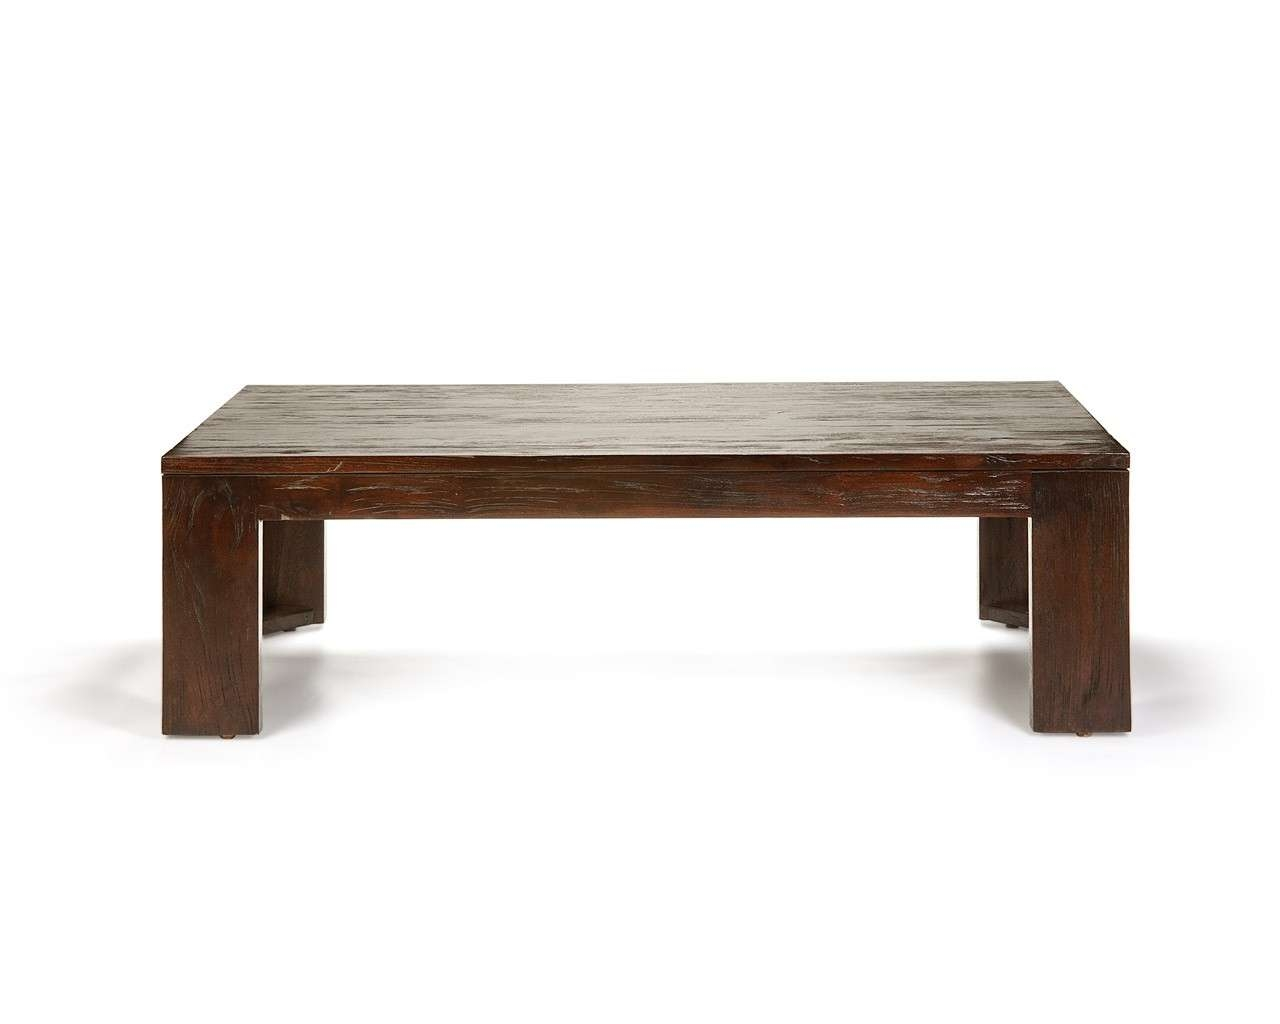 Coffee Tables Ideas: Vintage Motifs Dark Wood Coffee Tables Regarding Trendy Dark Wooden Coffee Tables (View 13 of 20)